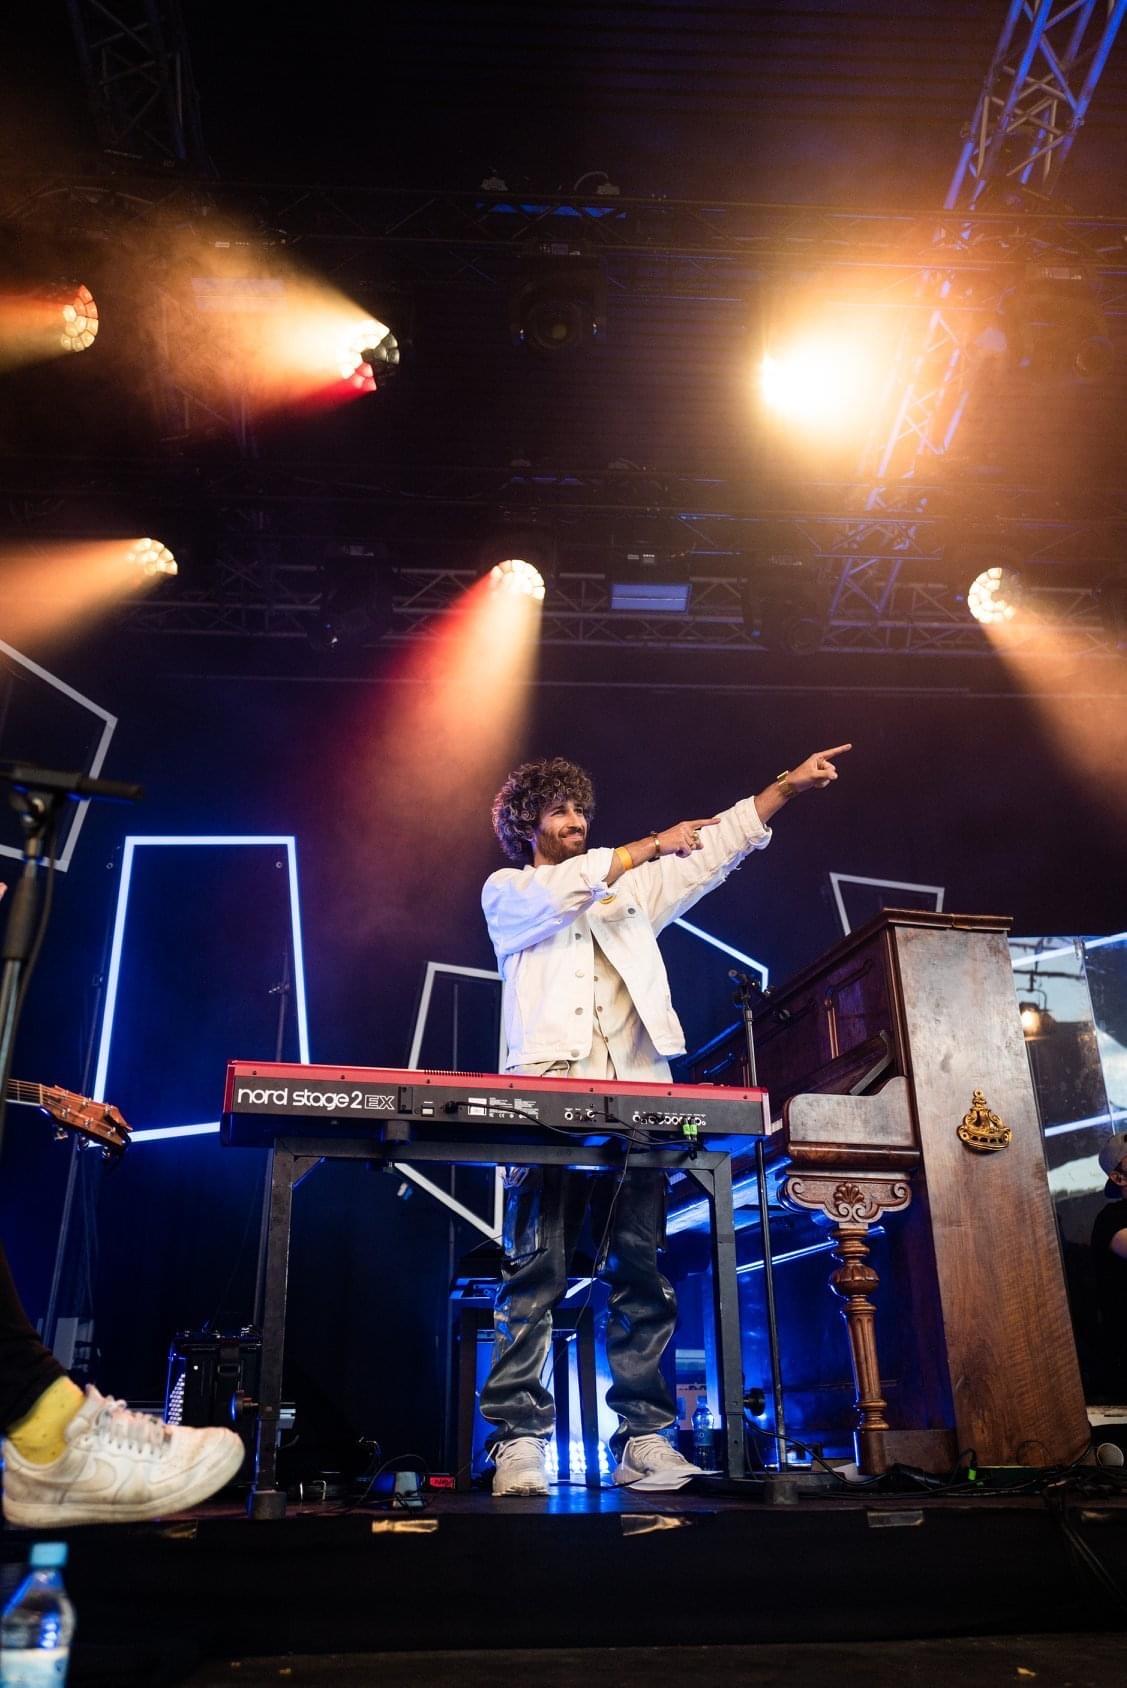 FRESH-MUSIC-LIVE_KEYBOARD_GABRIEL_DENHOFF06